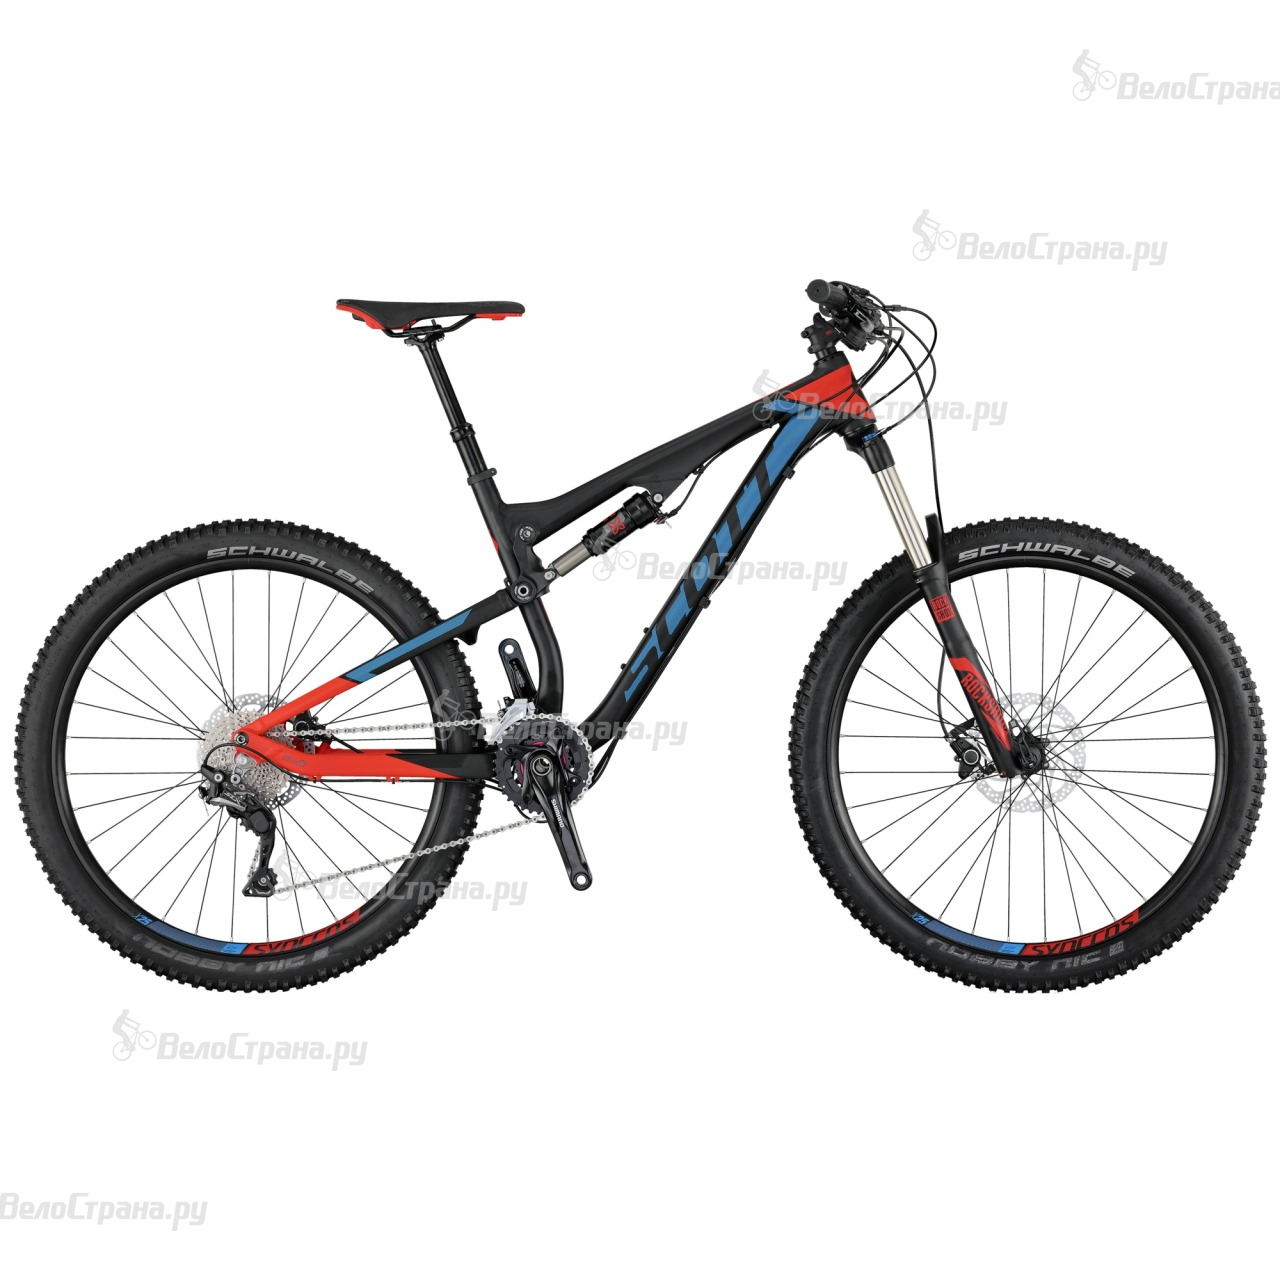 Велосипед Scott Genius 750 (2017)